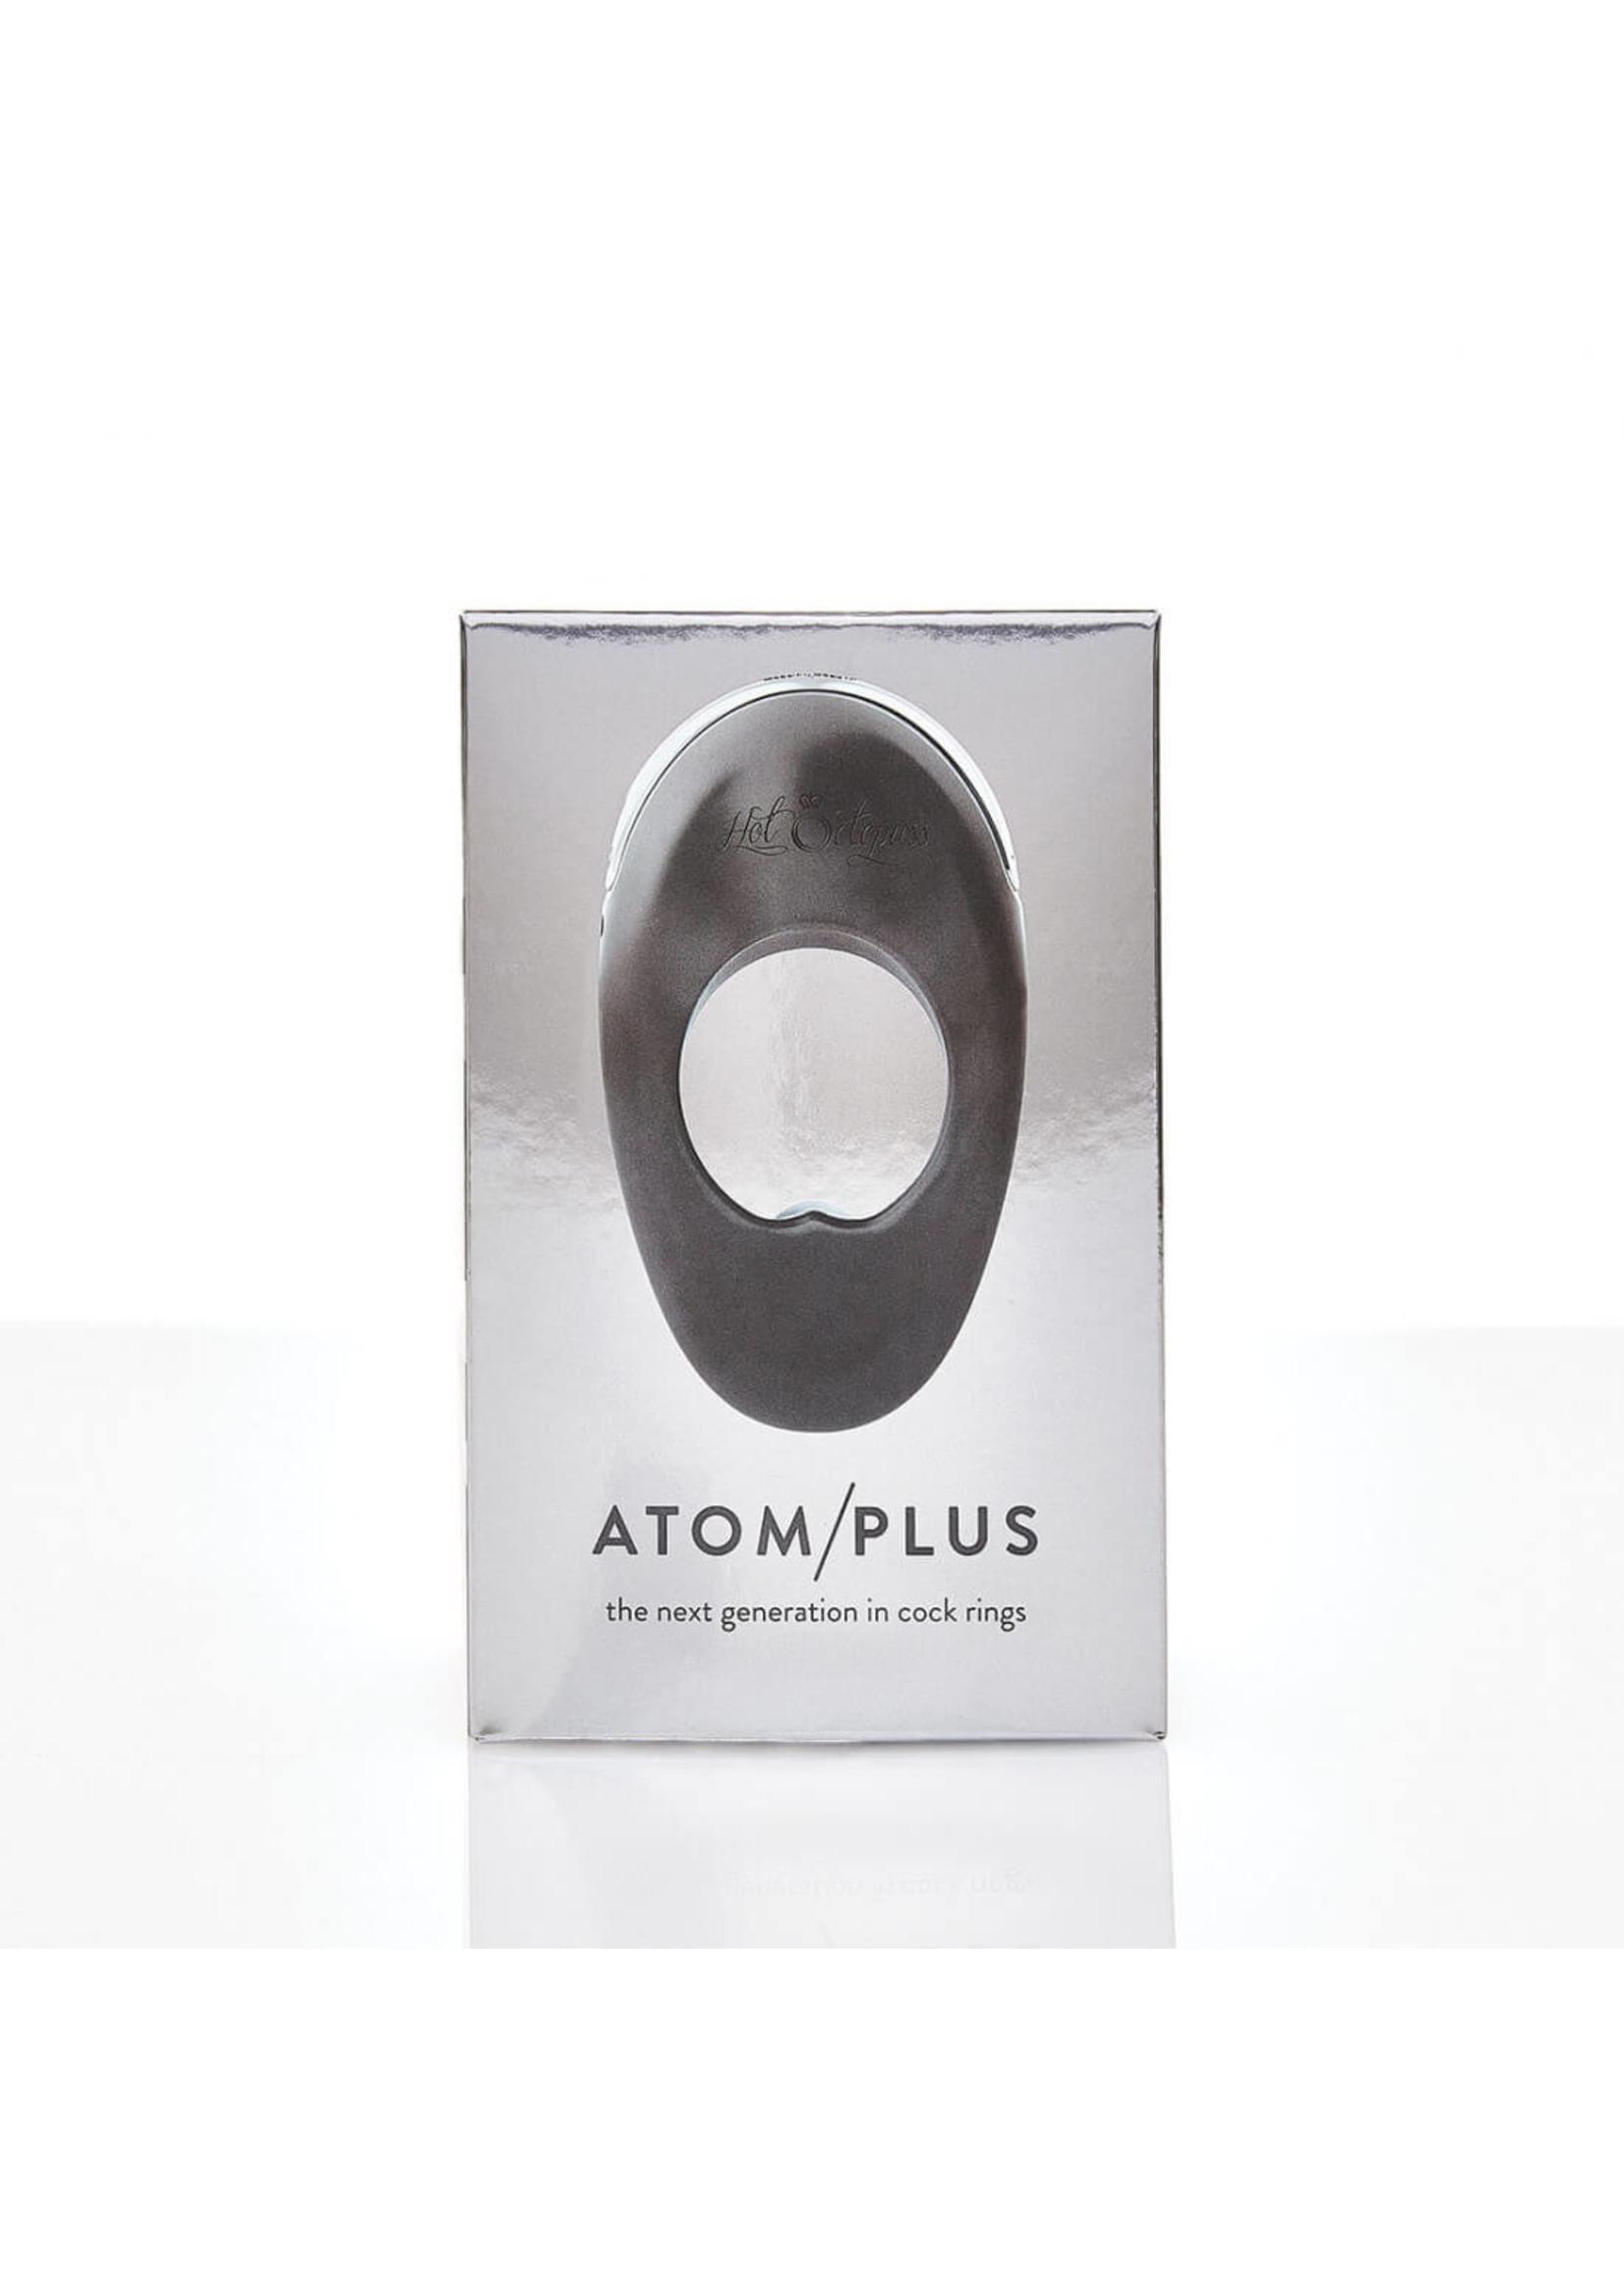 Hot Octopuss-Atom Plus